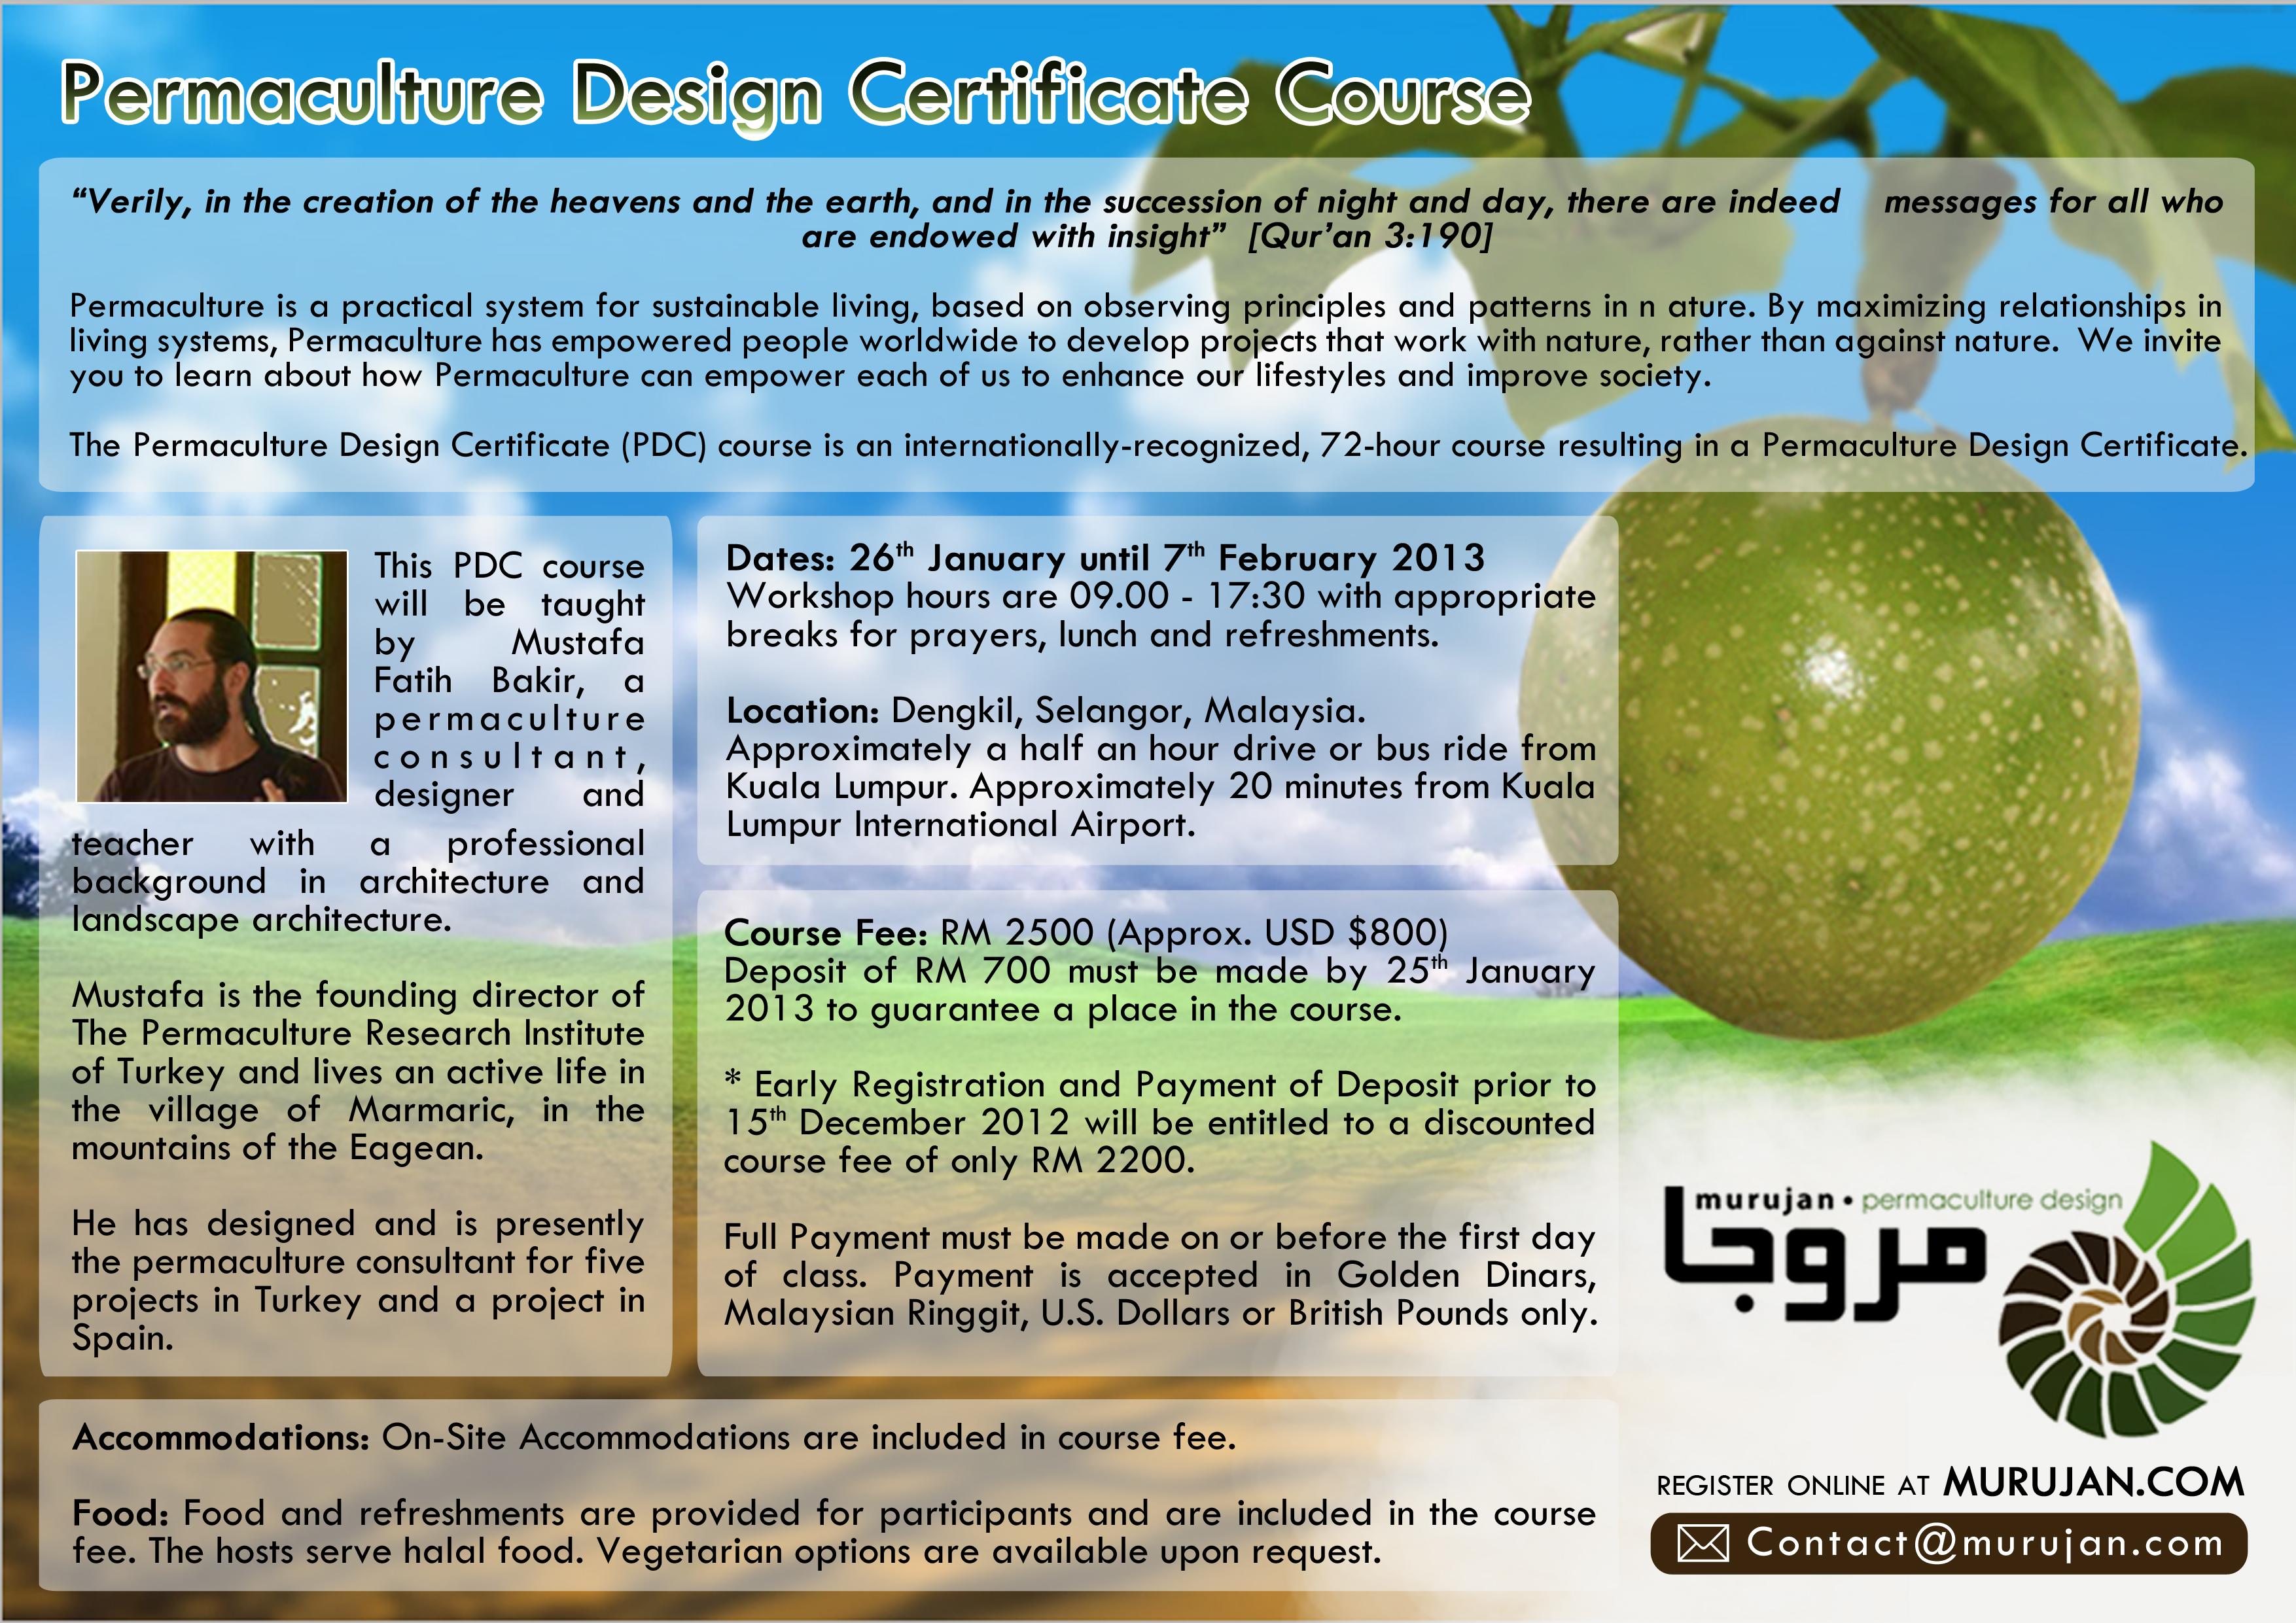 Poster design fee - Download Poster